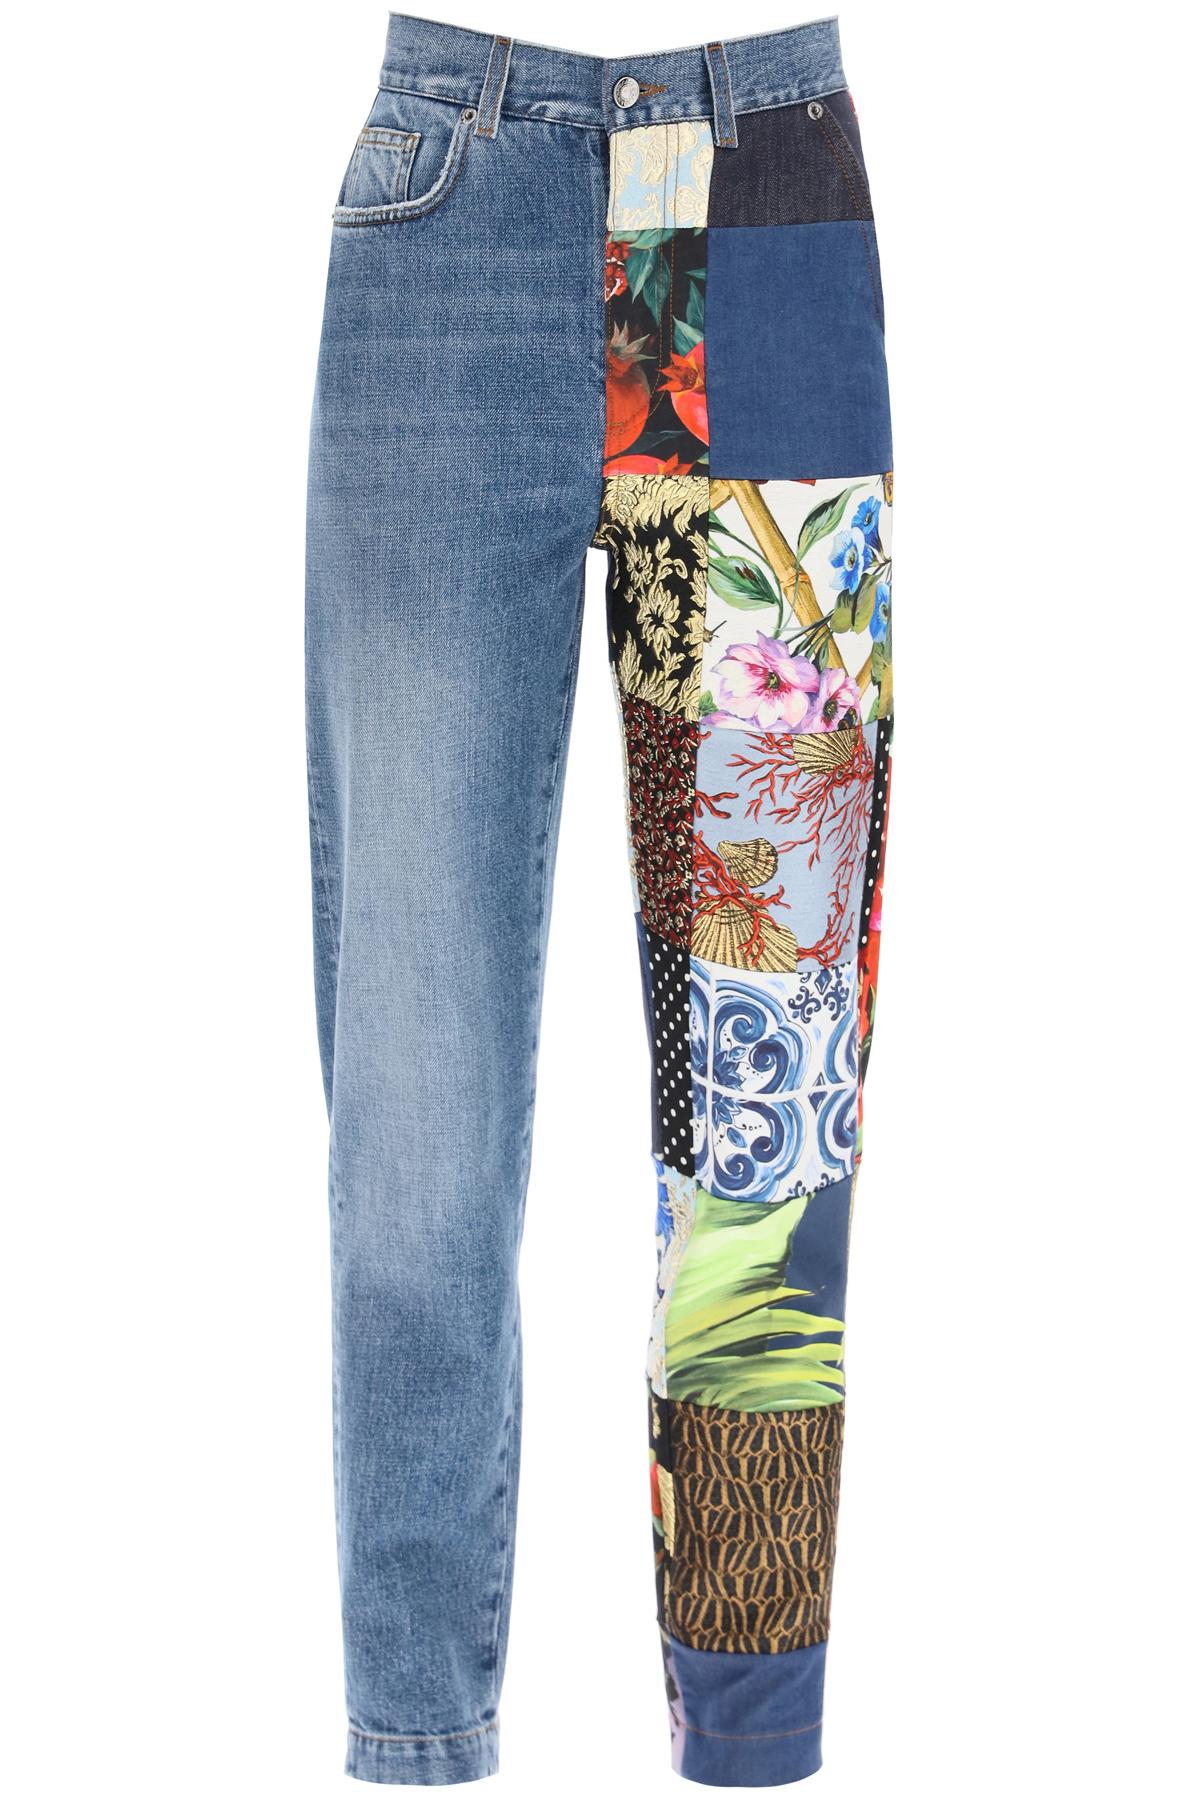 Dolce & gabbana jeans patchwork multicolor